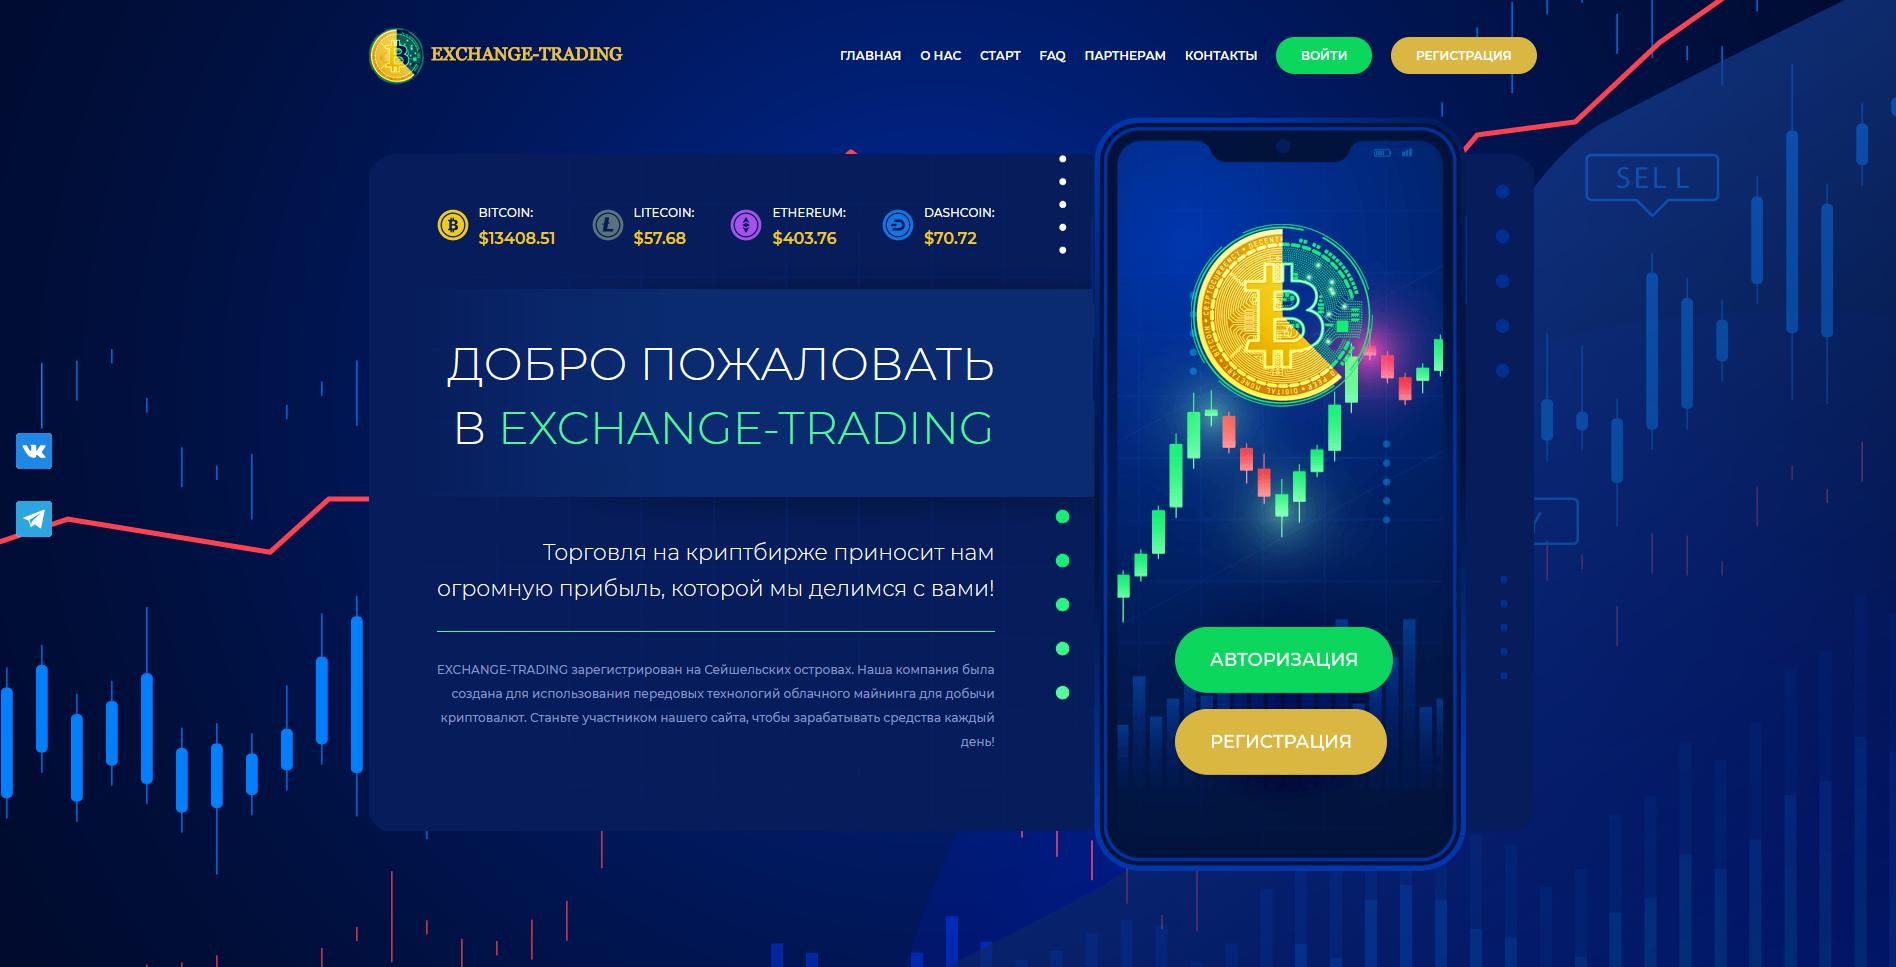 Exchange-trading